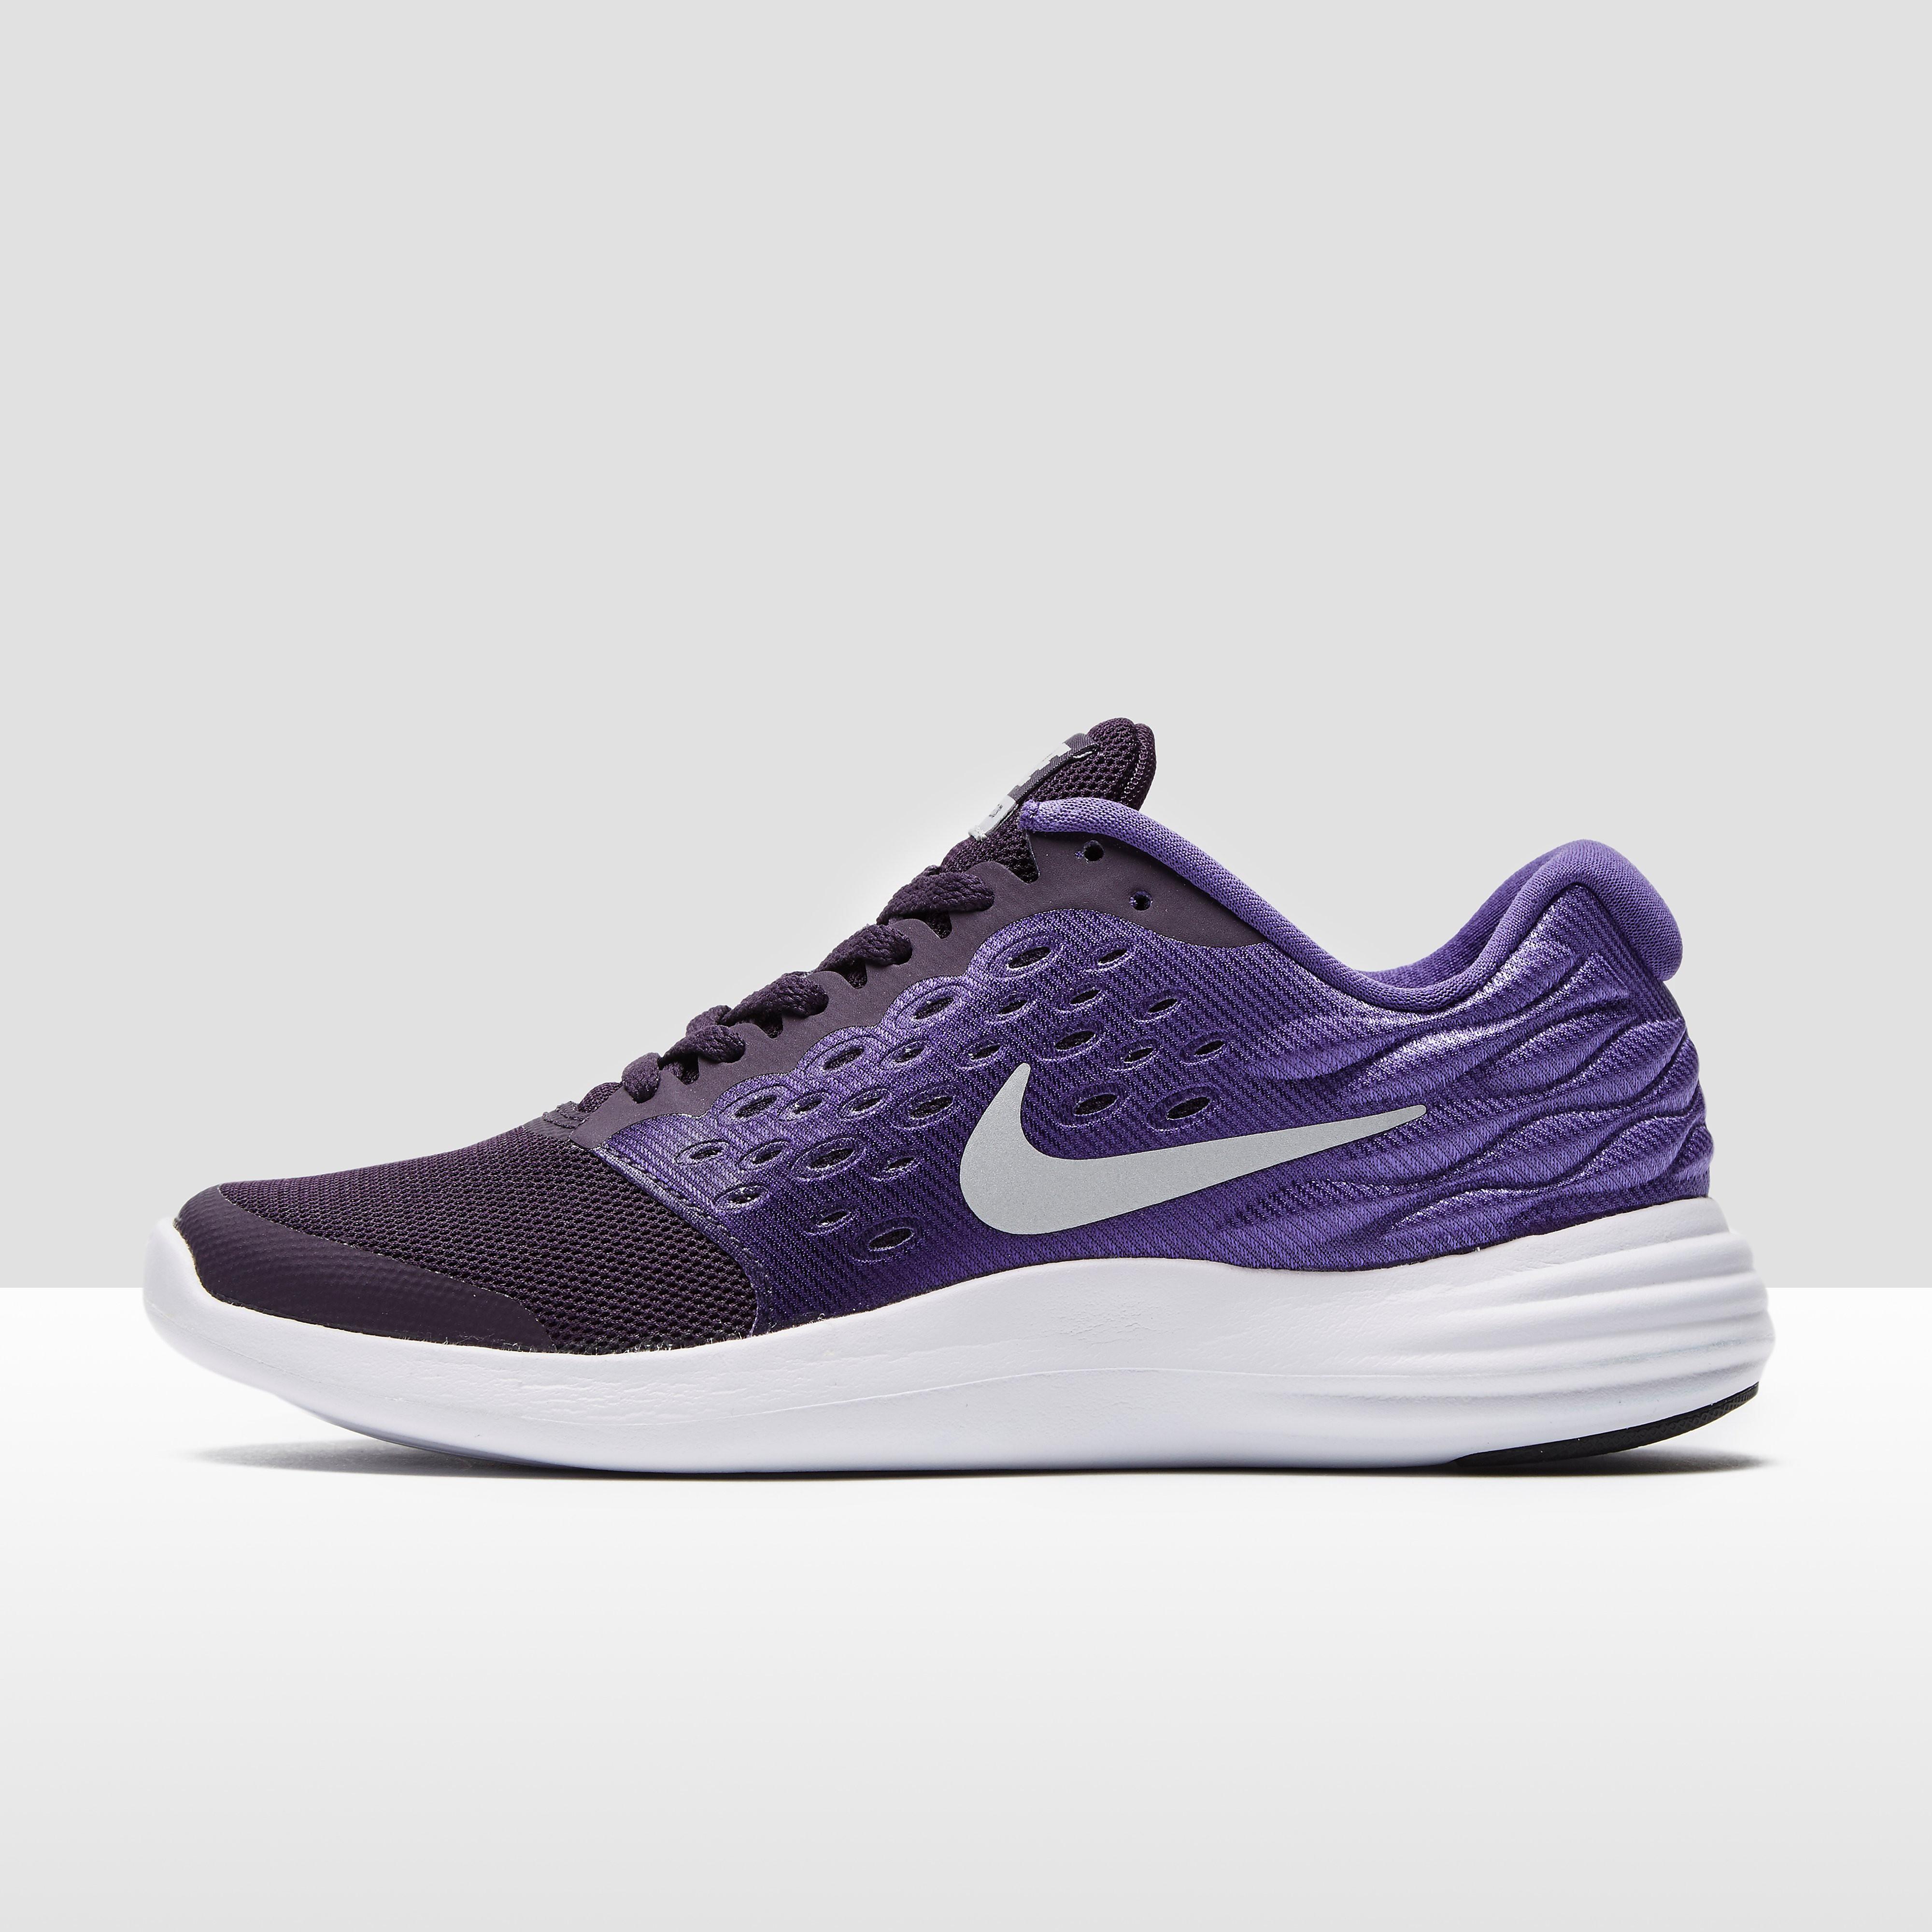 Nike LunarStelos Junior Running Shoes